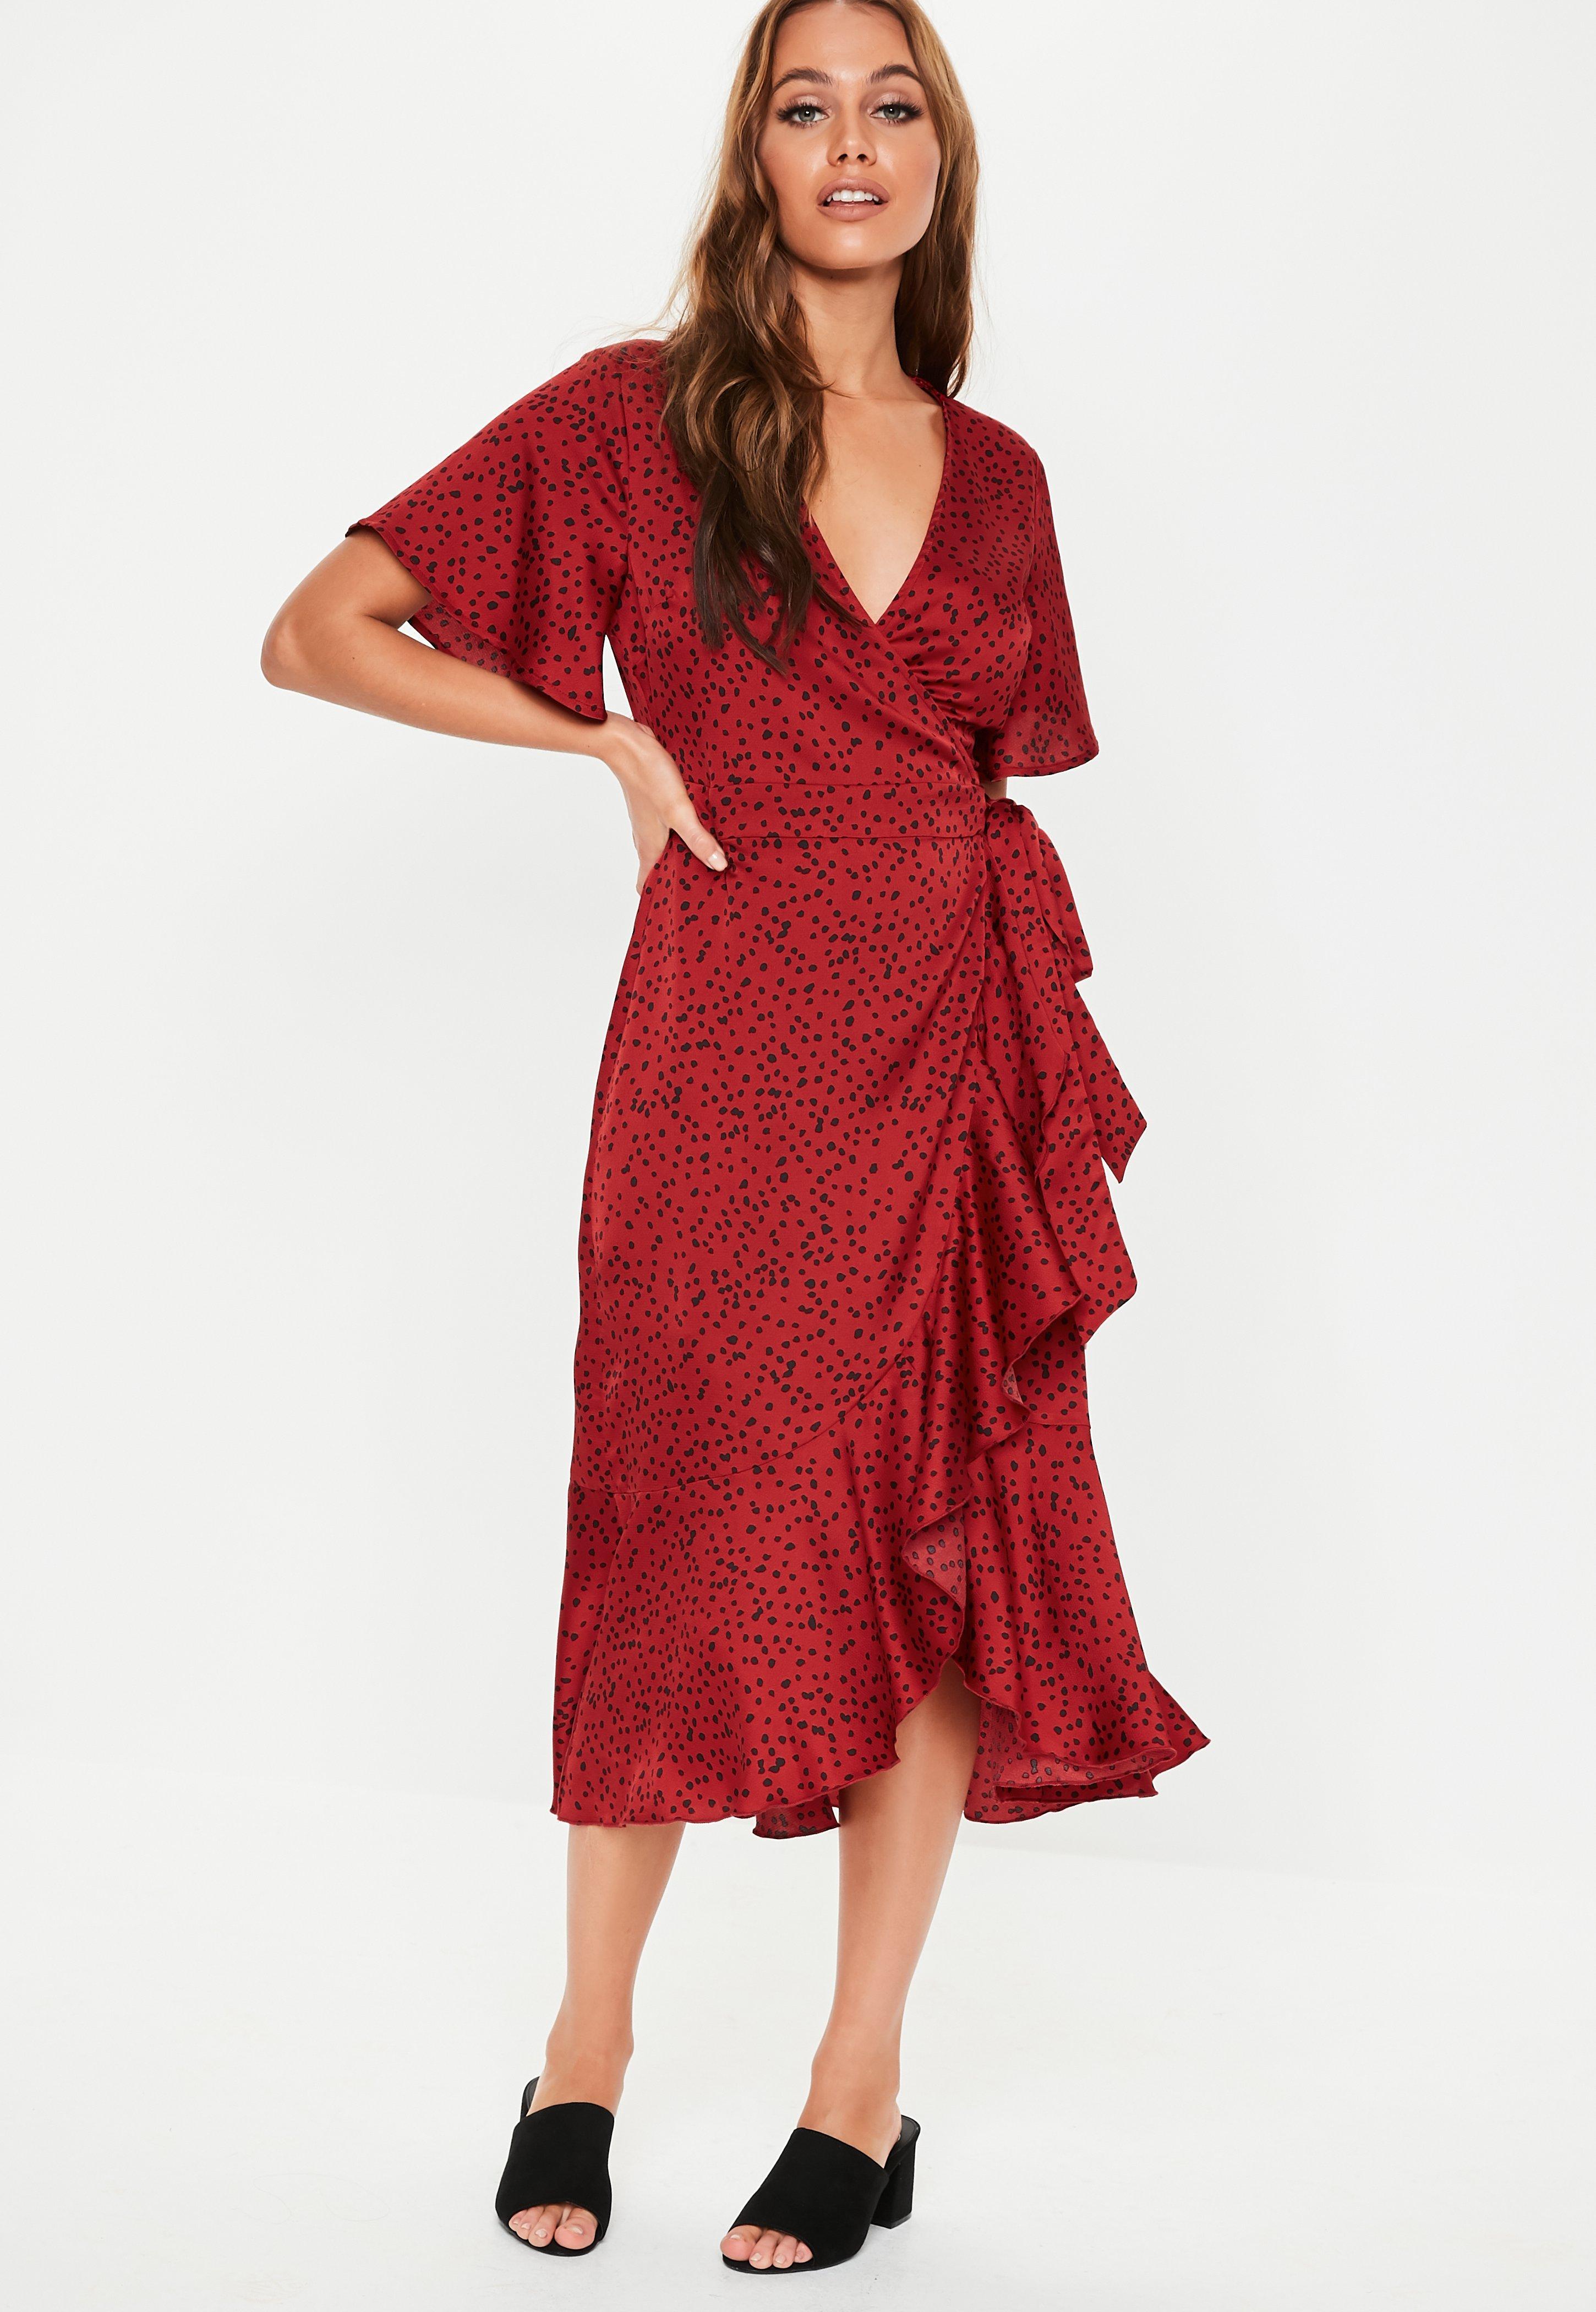 Rote kleider a linie